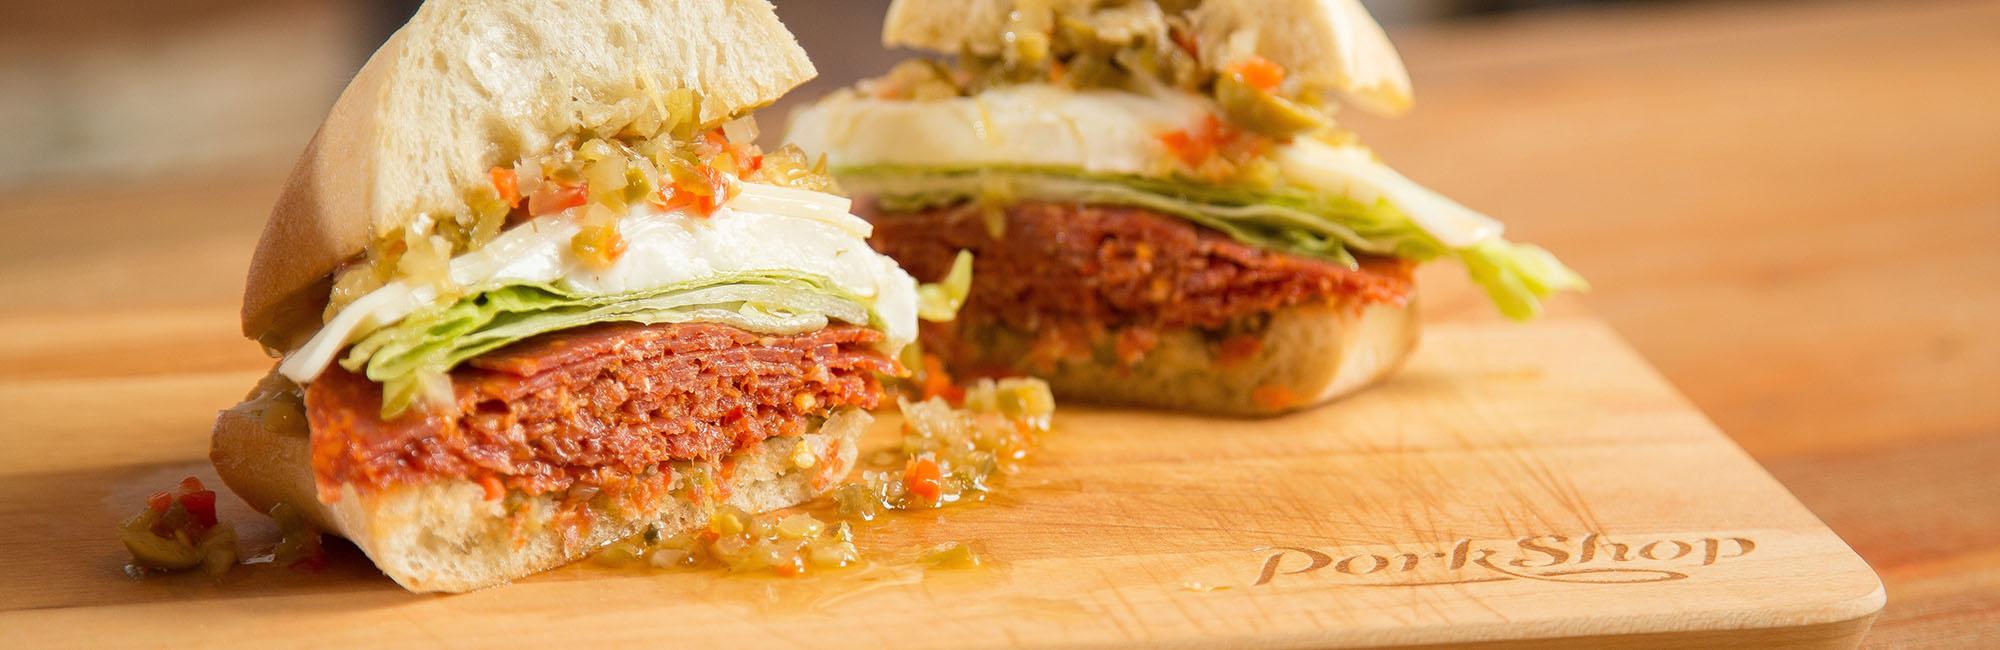 Sandwich-Muffaletta-PorkShop-header.jpg